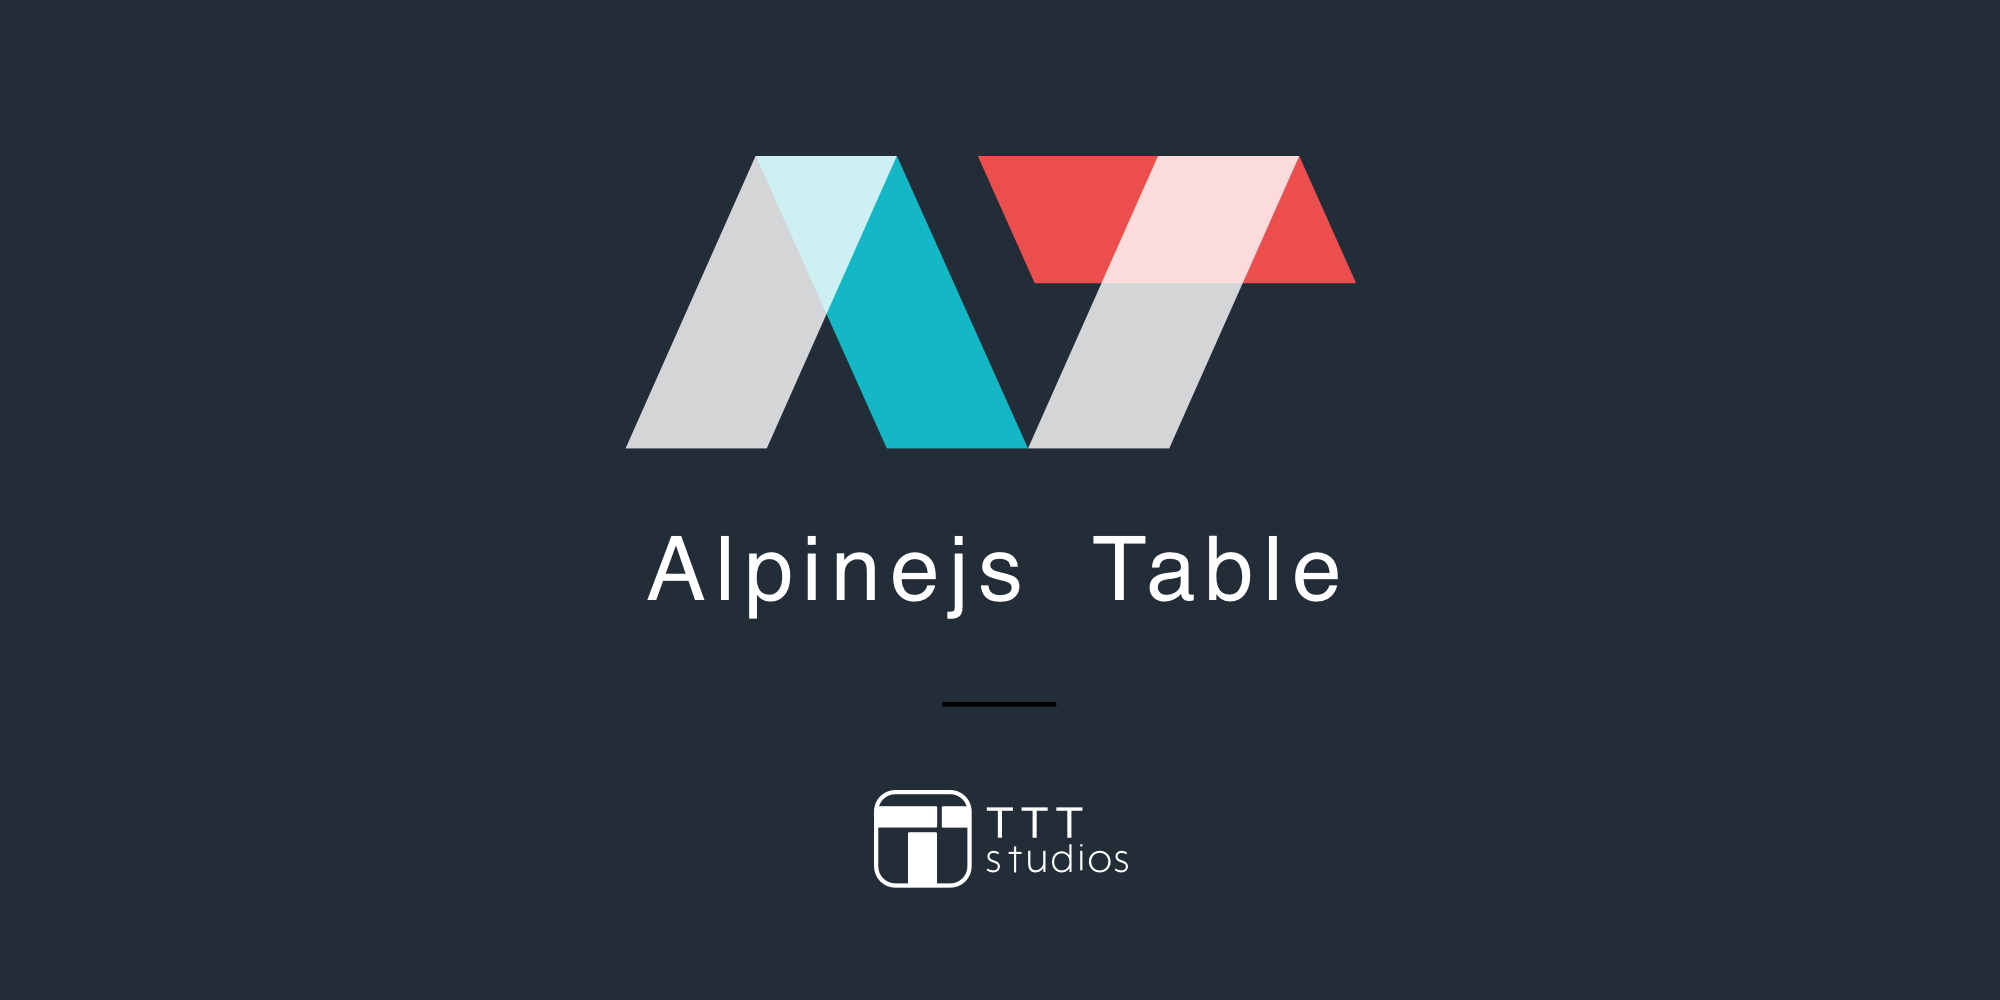 Alpinejs Table logo for blog